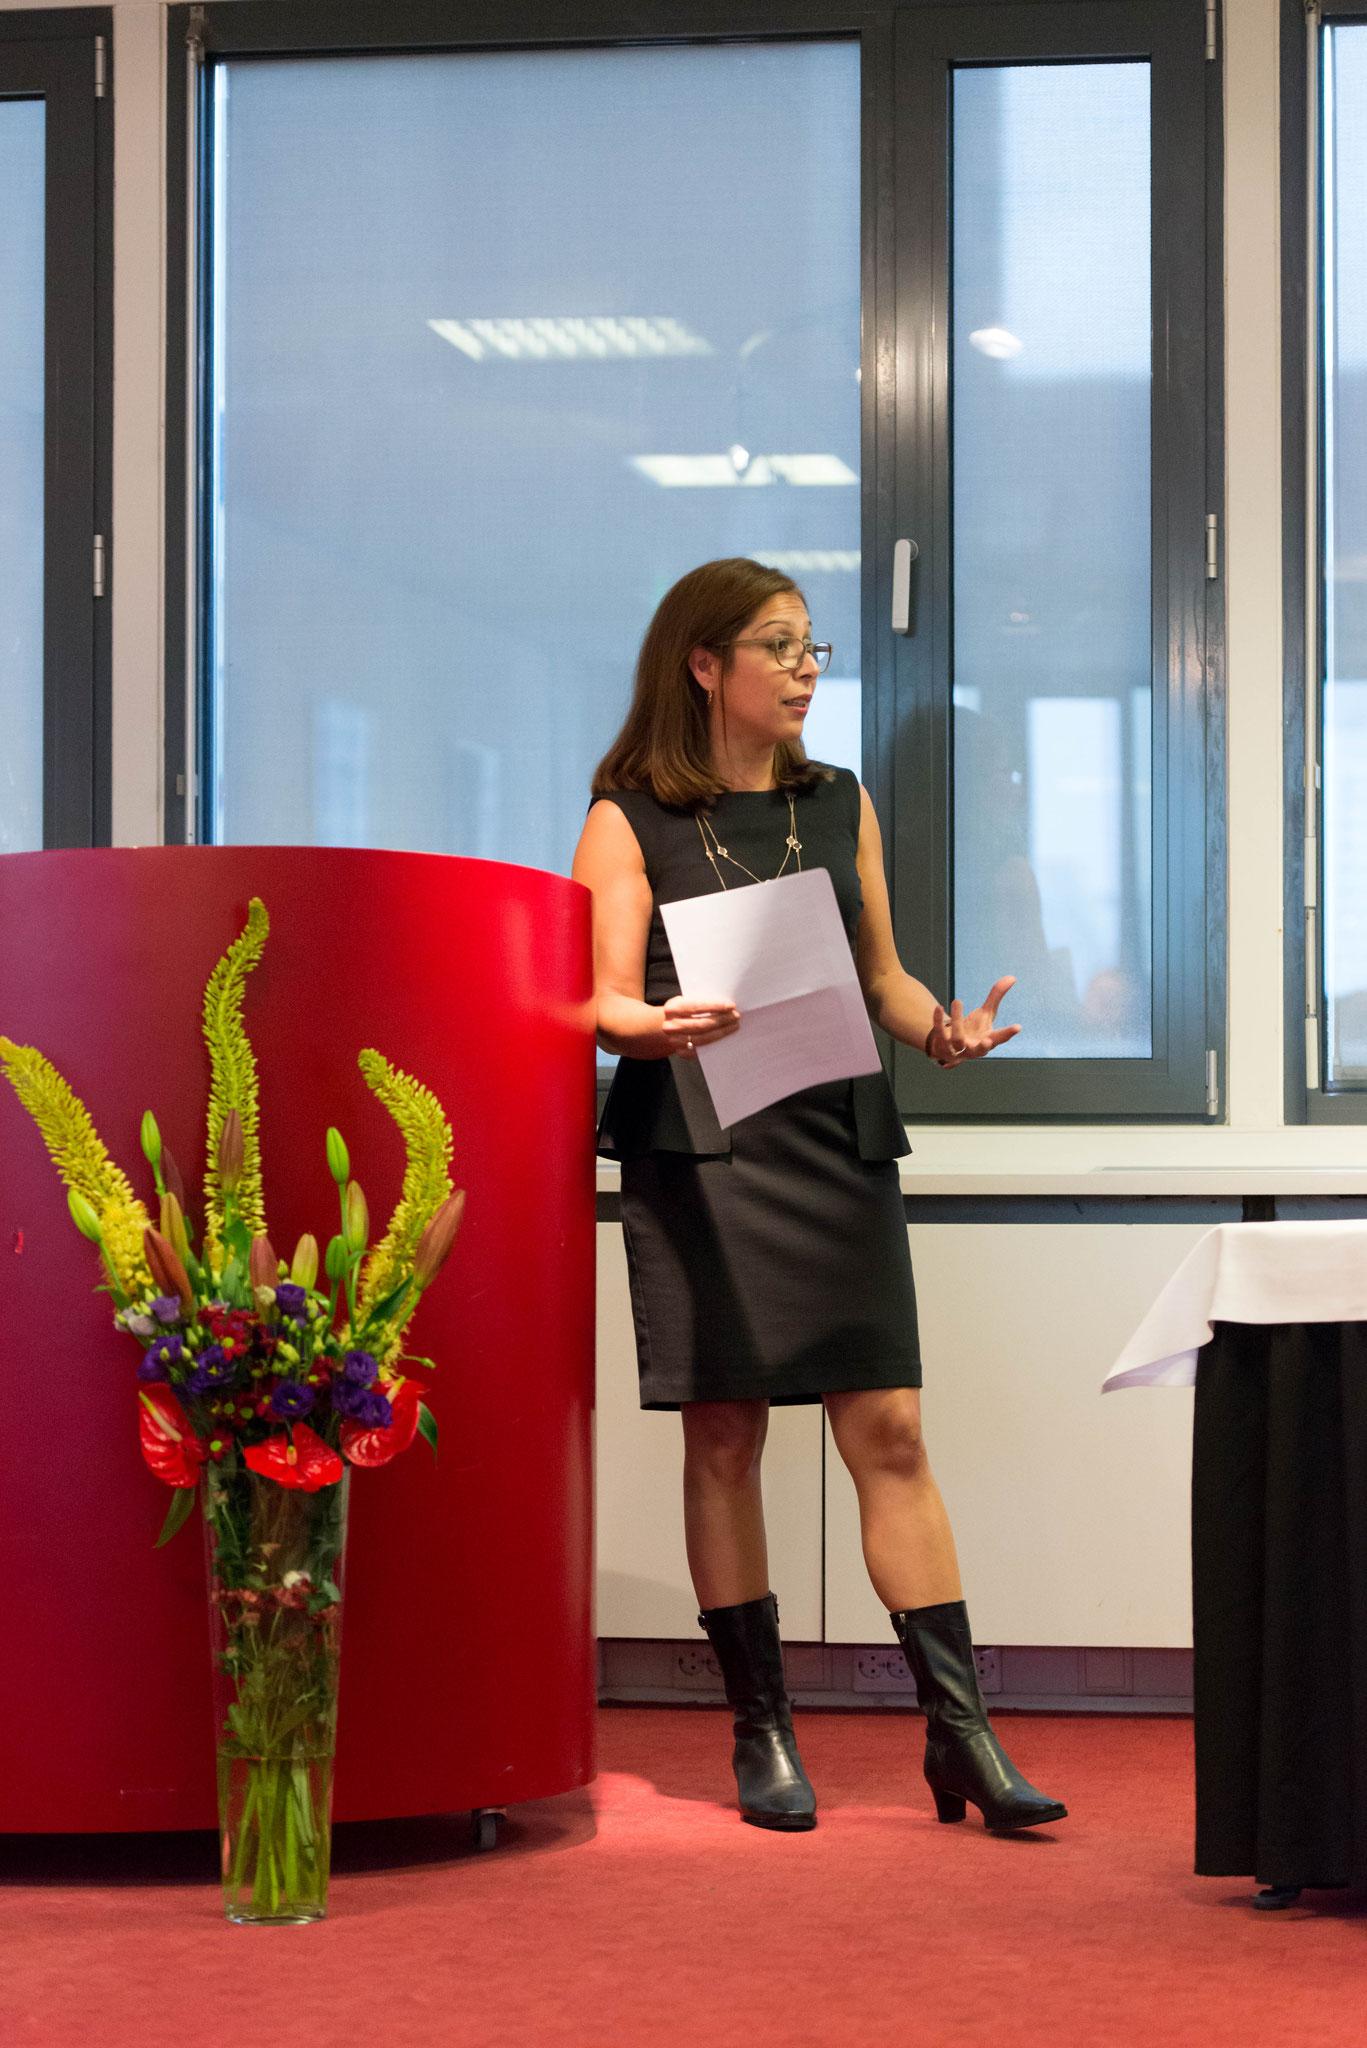 Speech Diploma-uitreiking  | © EuroCollege